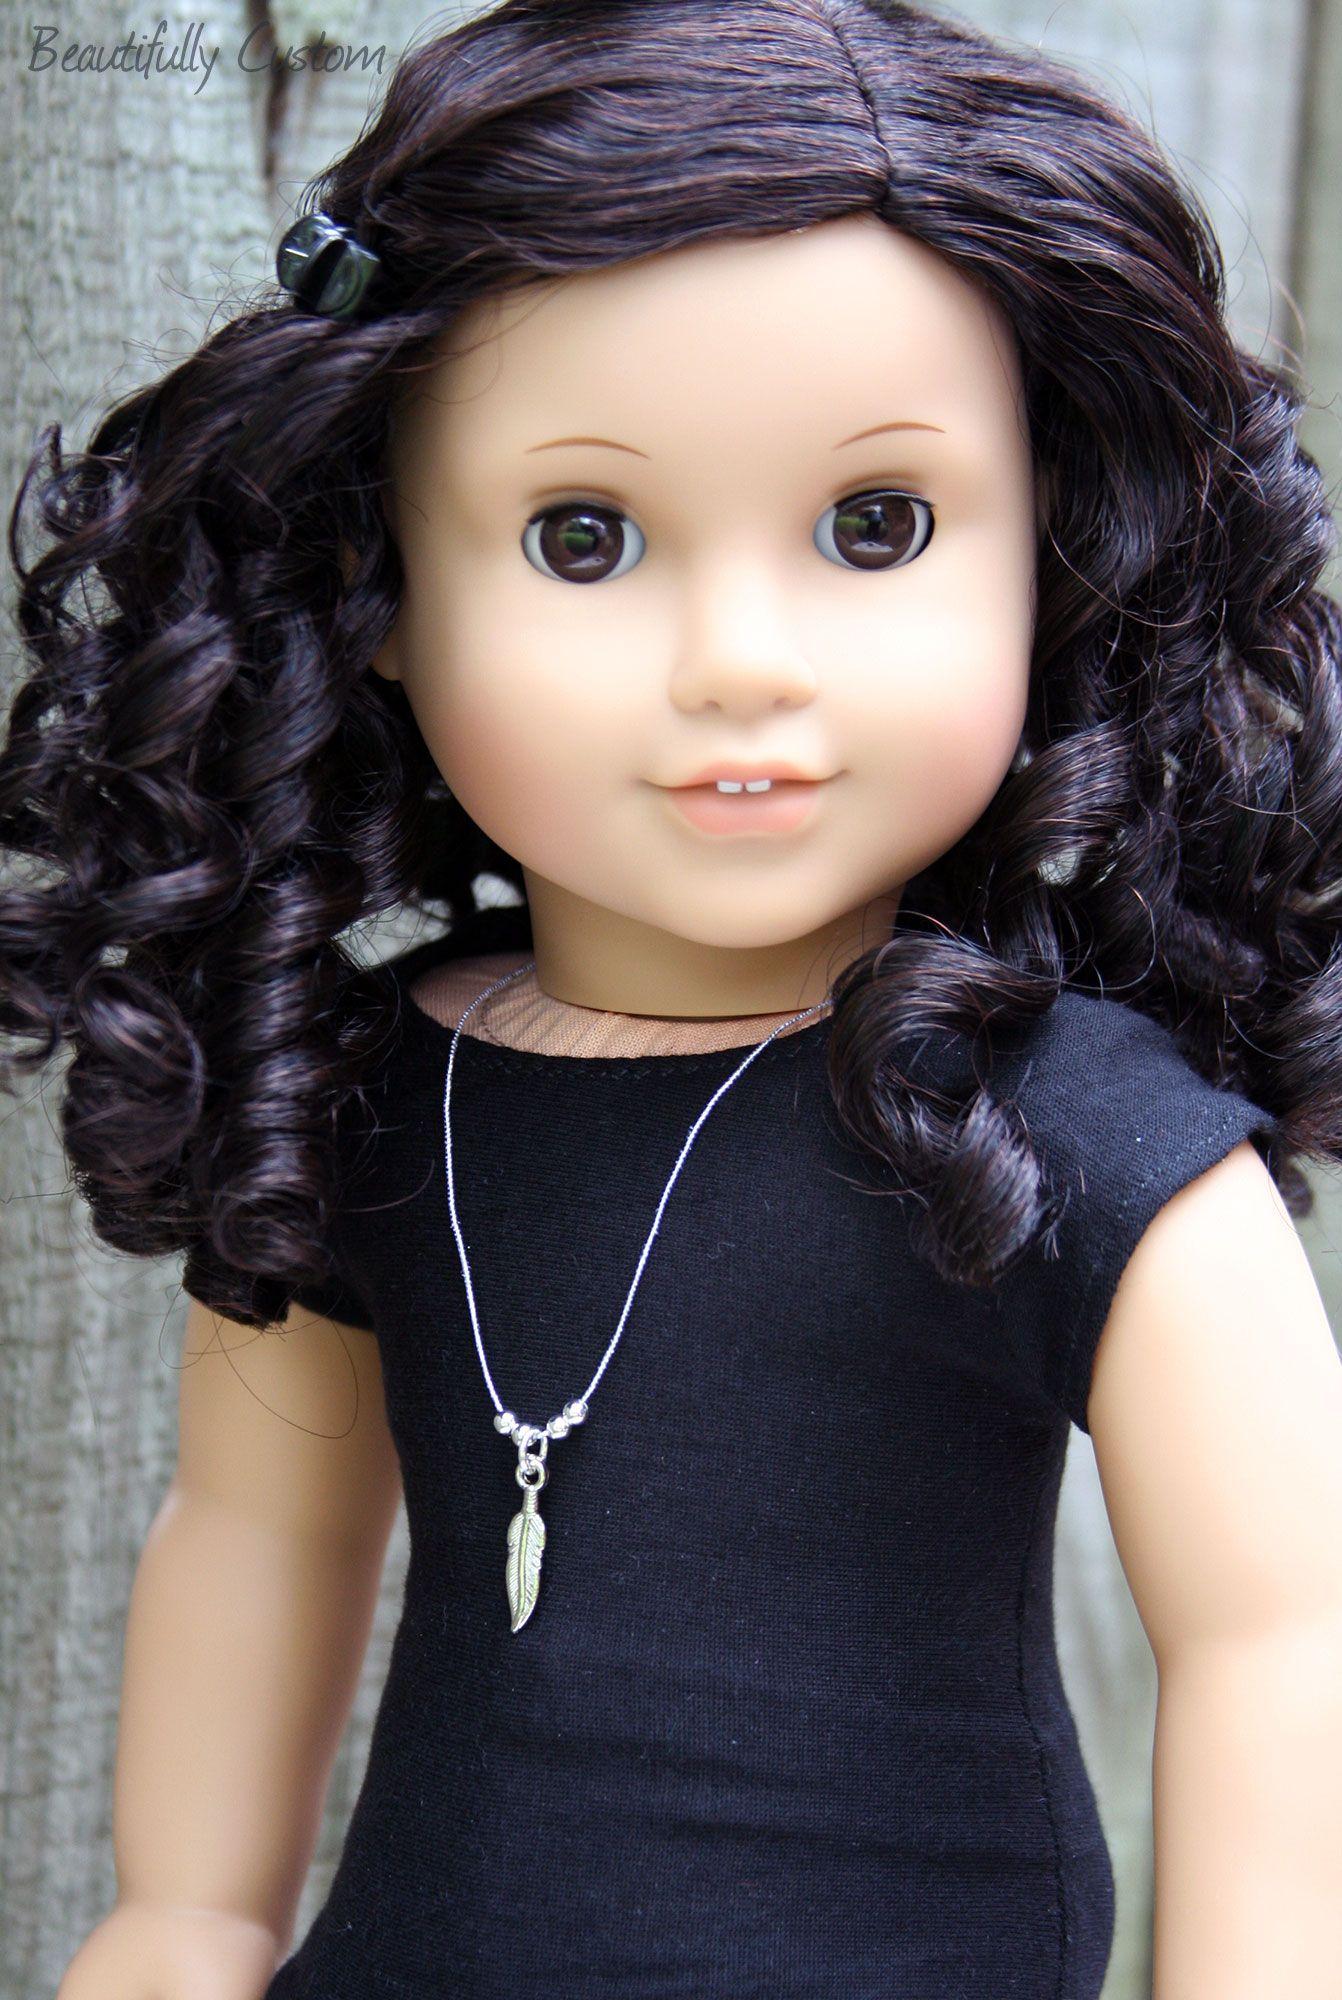 Custom american girl doll brown eyes and short curly